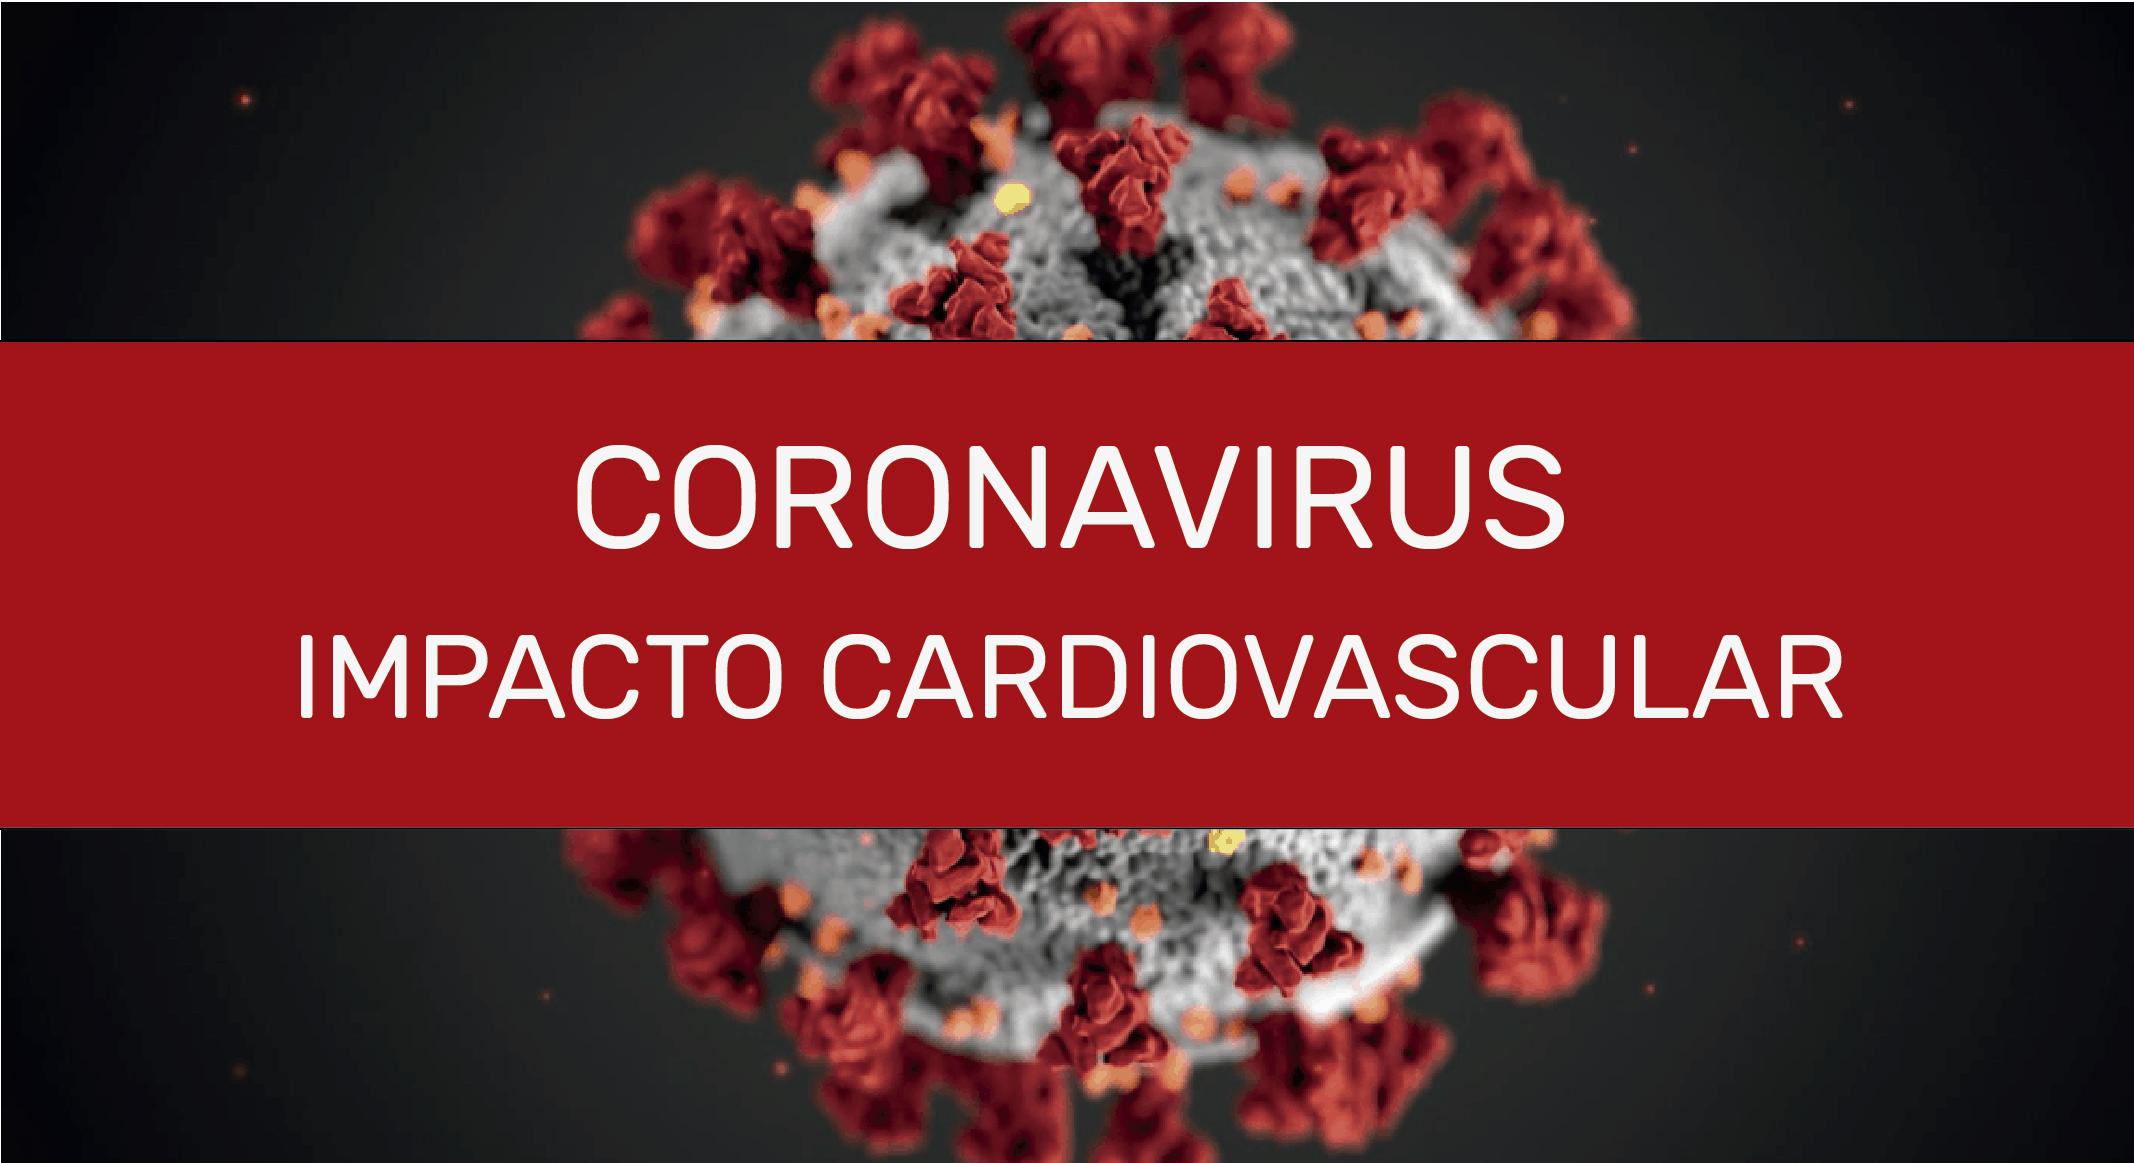 Coronavirus impacto cardiovascular